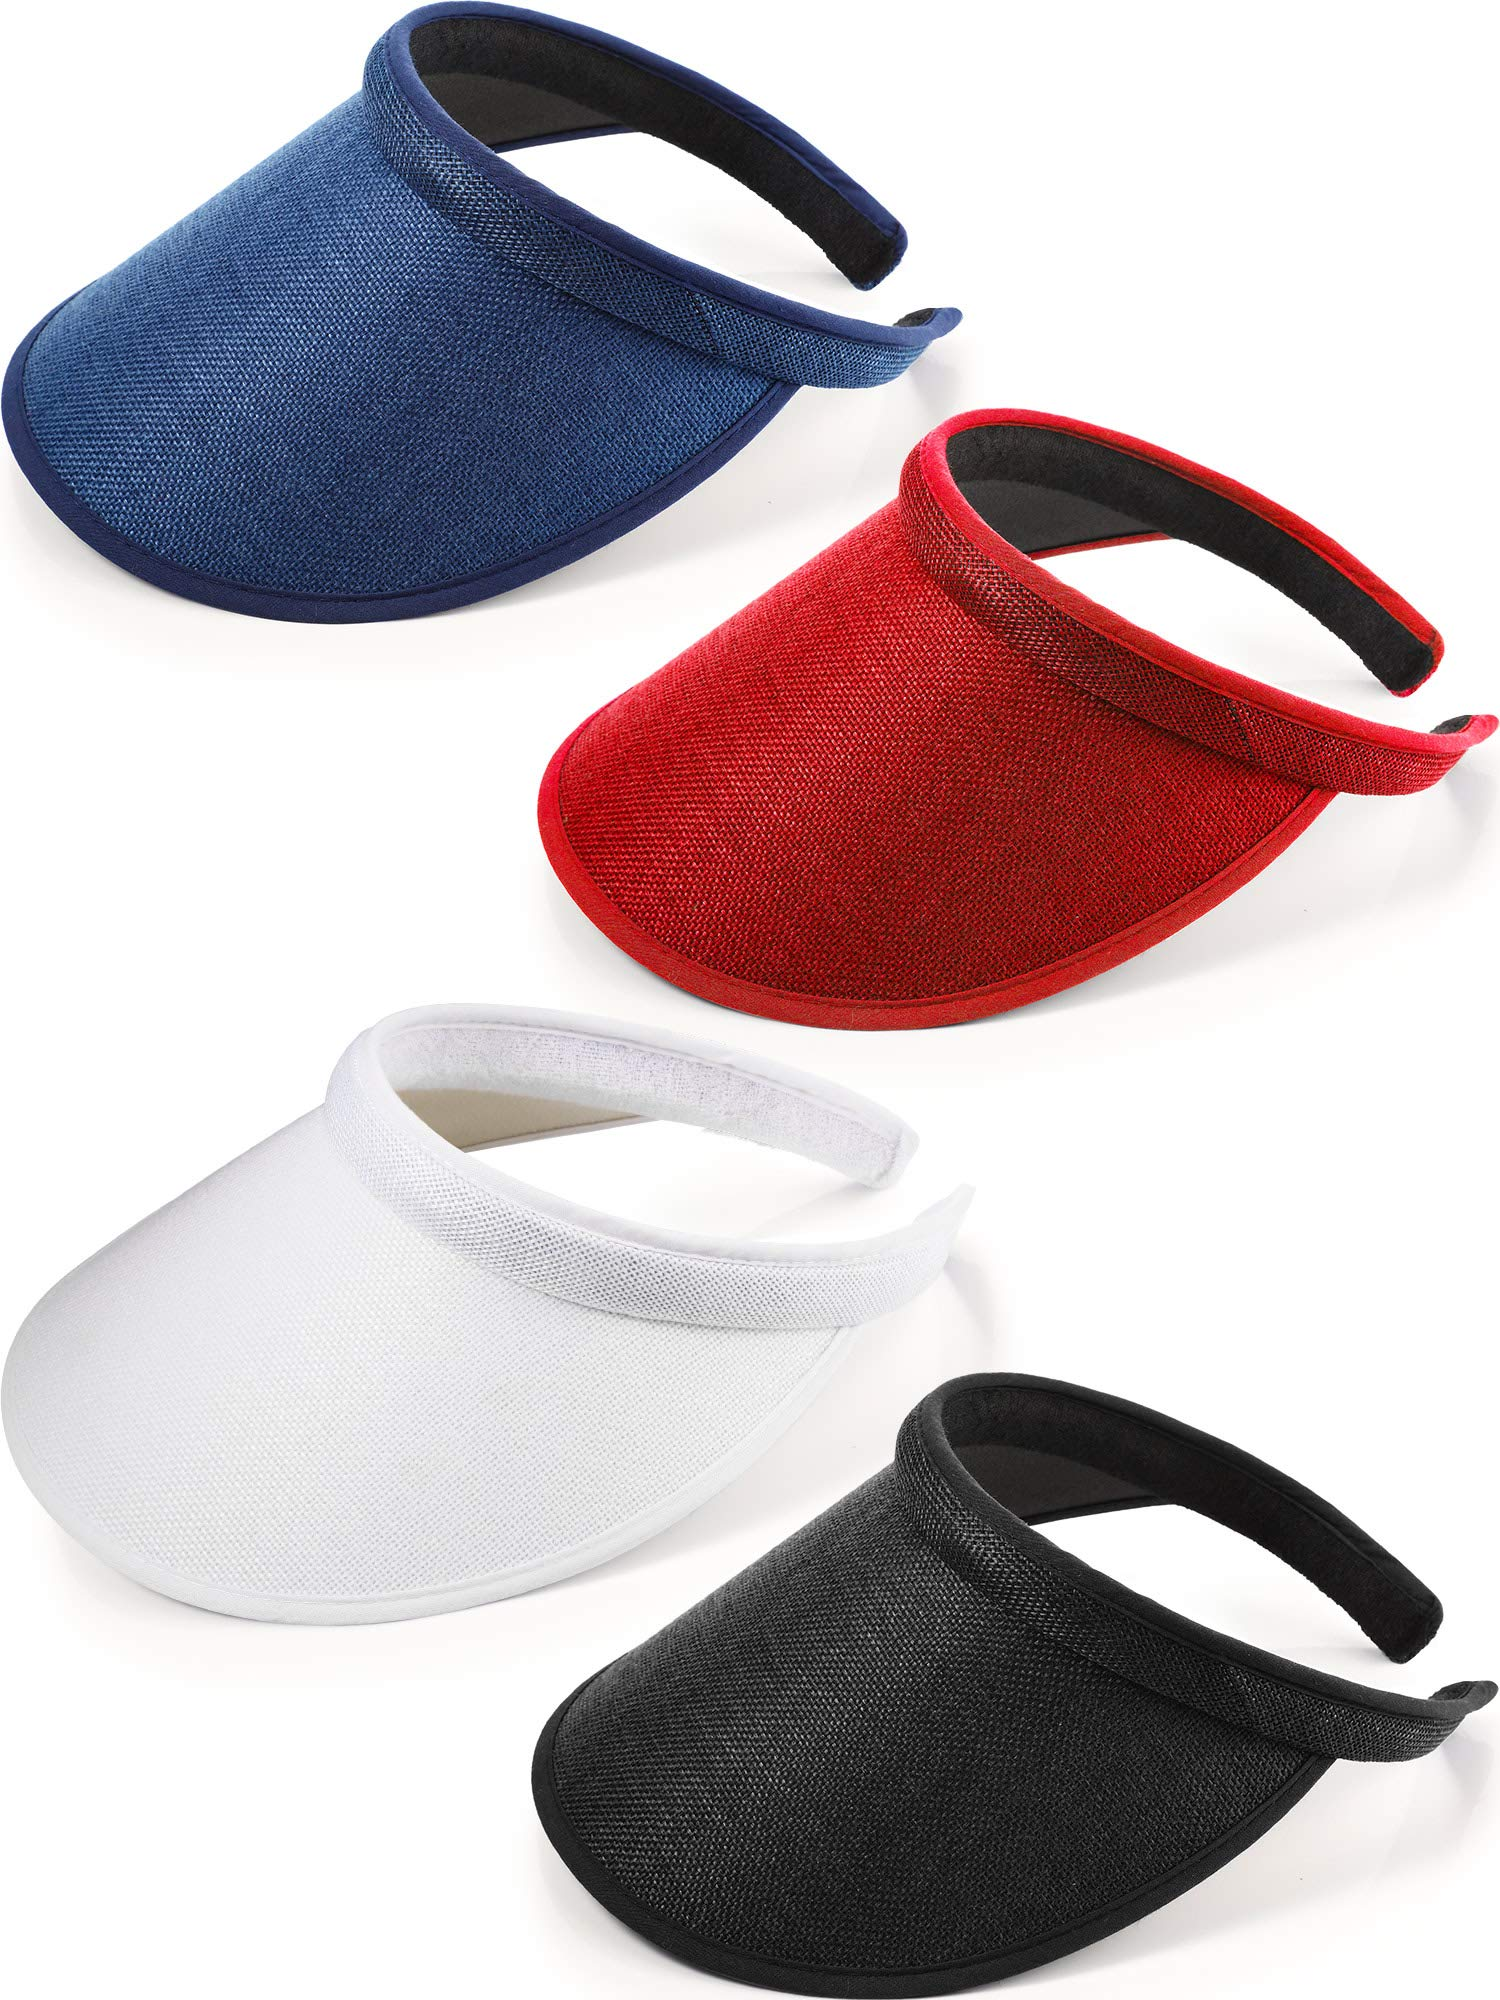 4 Pieces Clip on Visor Sun Visor Hat Wide Brim Clip on Head Cap Visors for Women